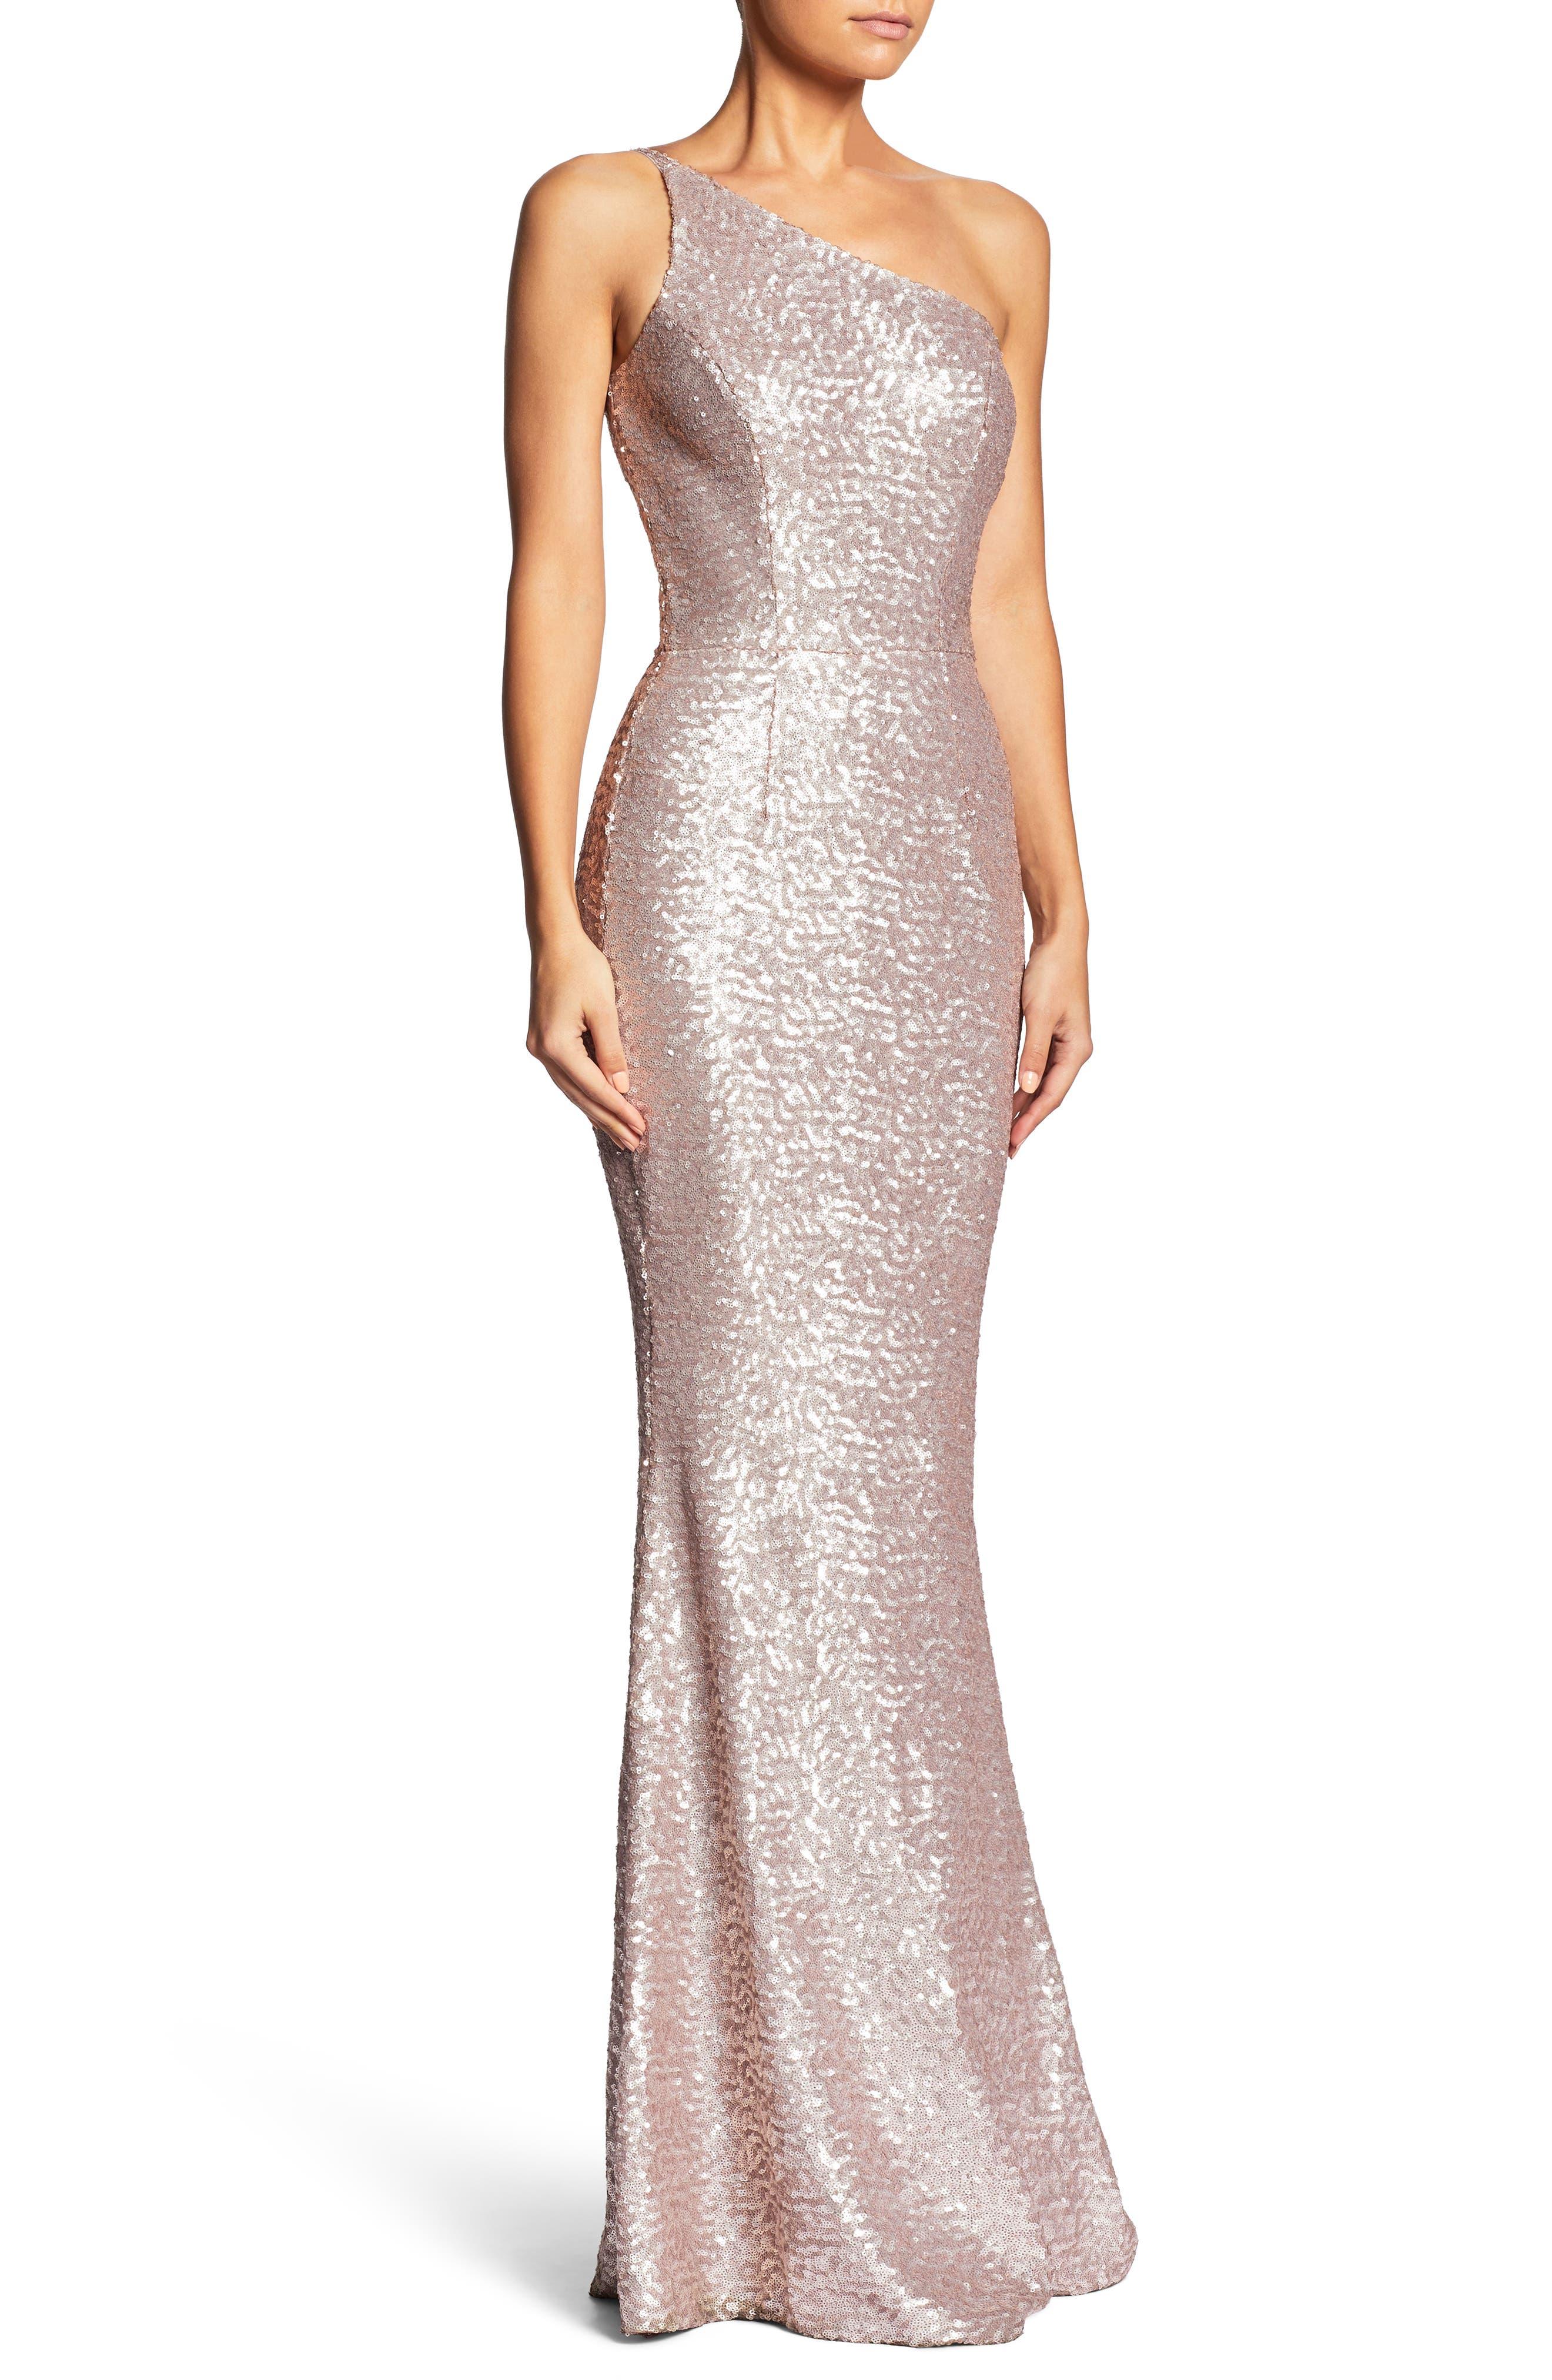 Bella One-Shoulder Mermaid Gown,                             Alternate thumbnail 4, color,                             Ice Pink